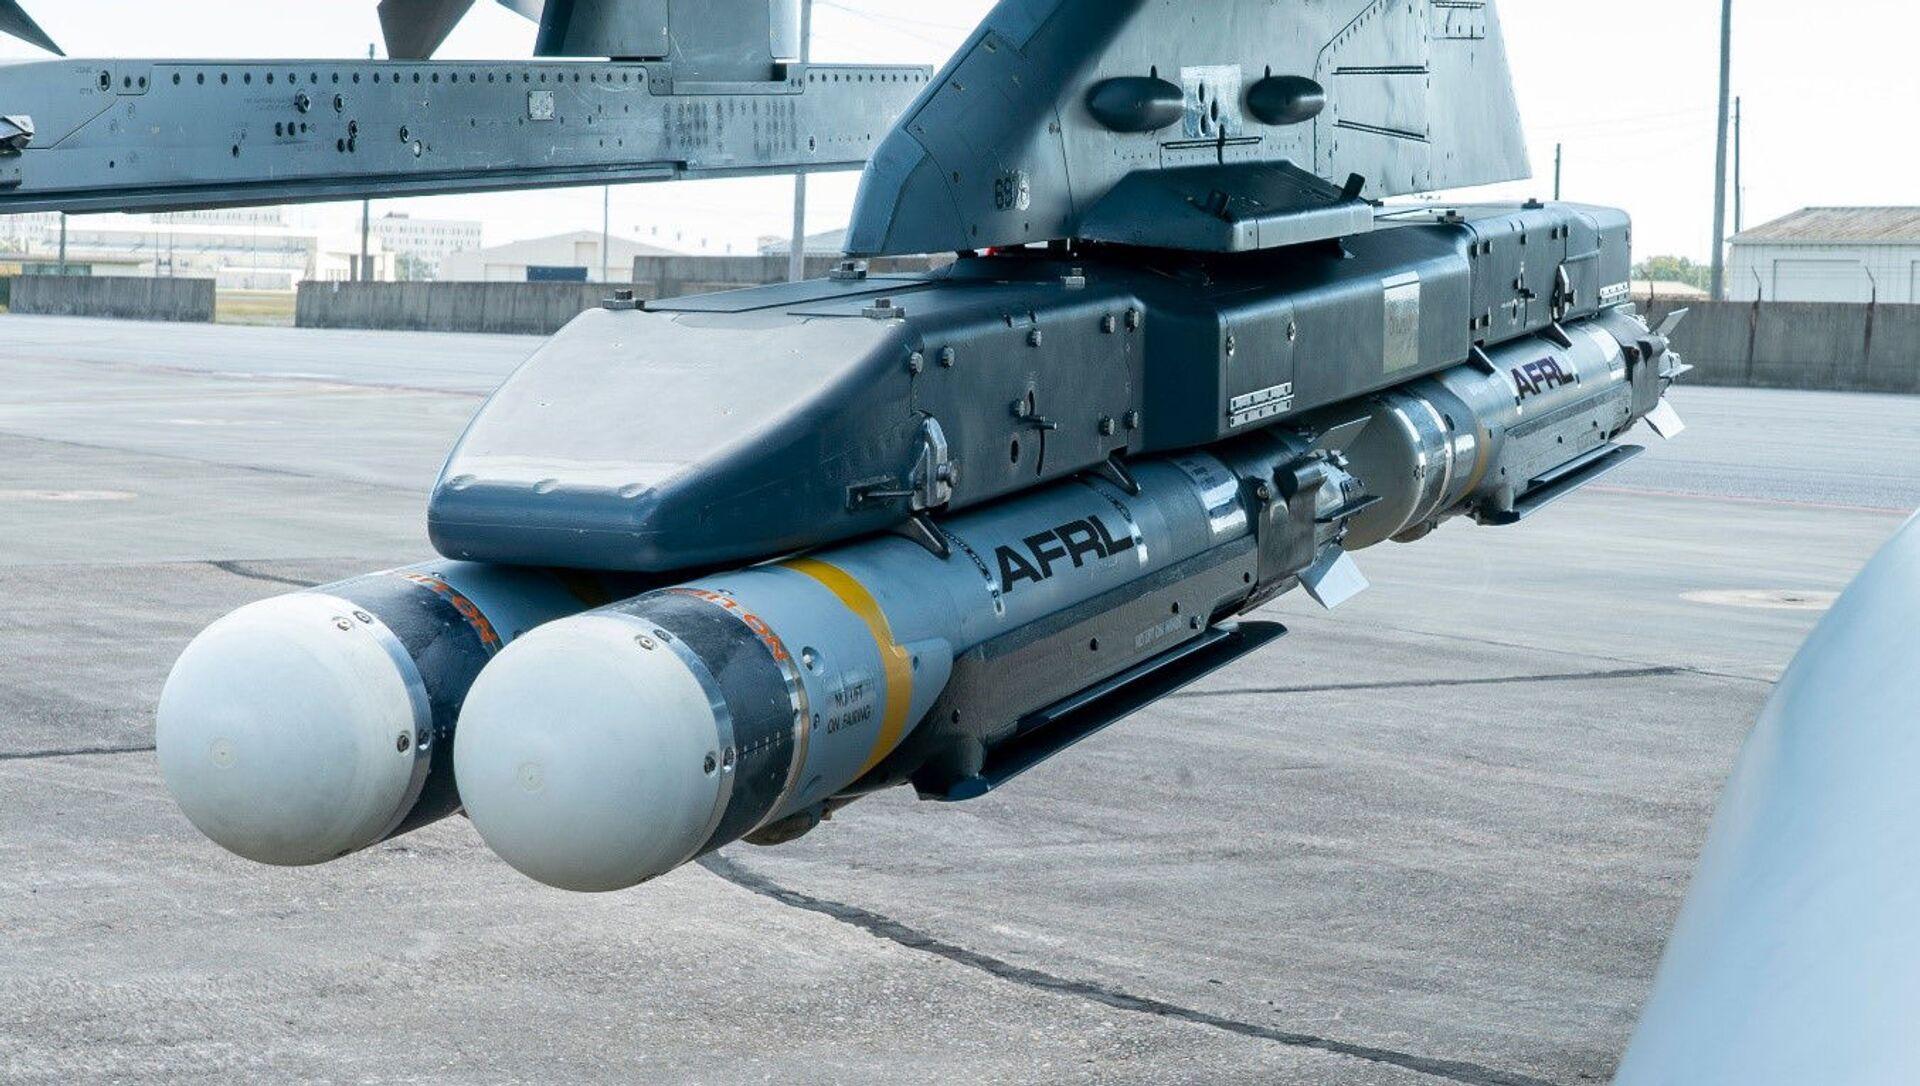 Bomby na F-16  - Sputnik Polska, 1920, 27.02.2021